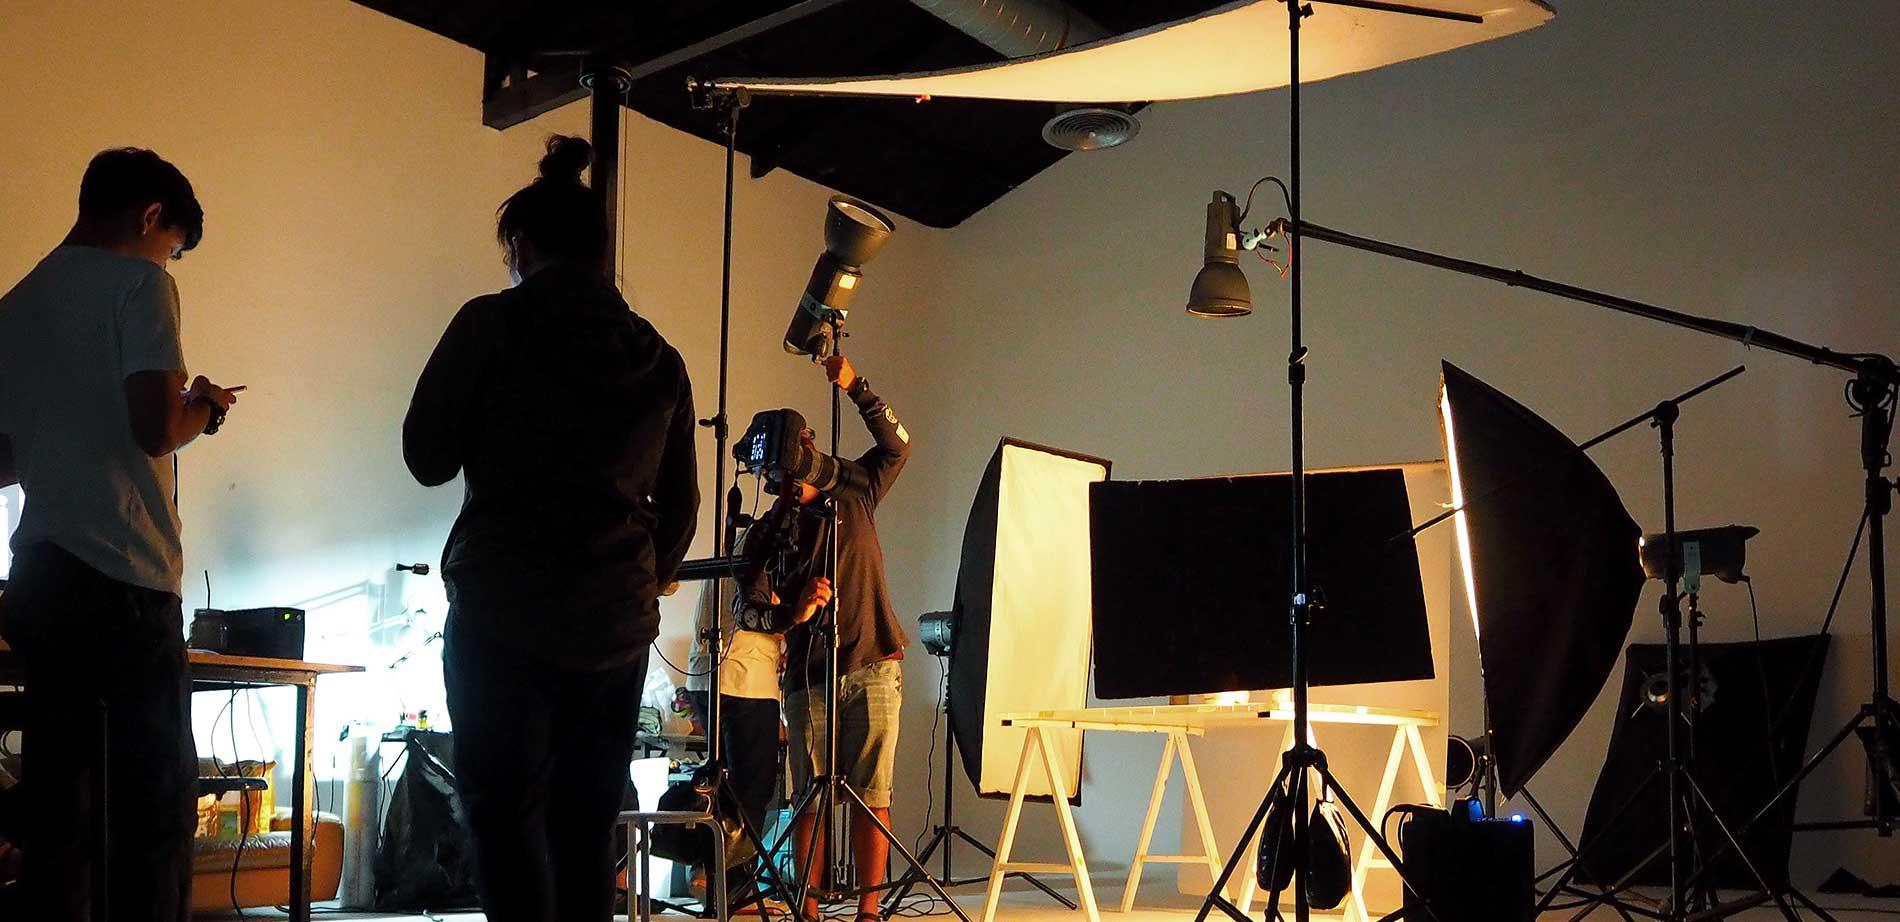 Studio Support - Sydney Event Services